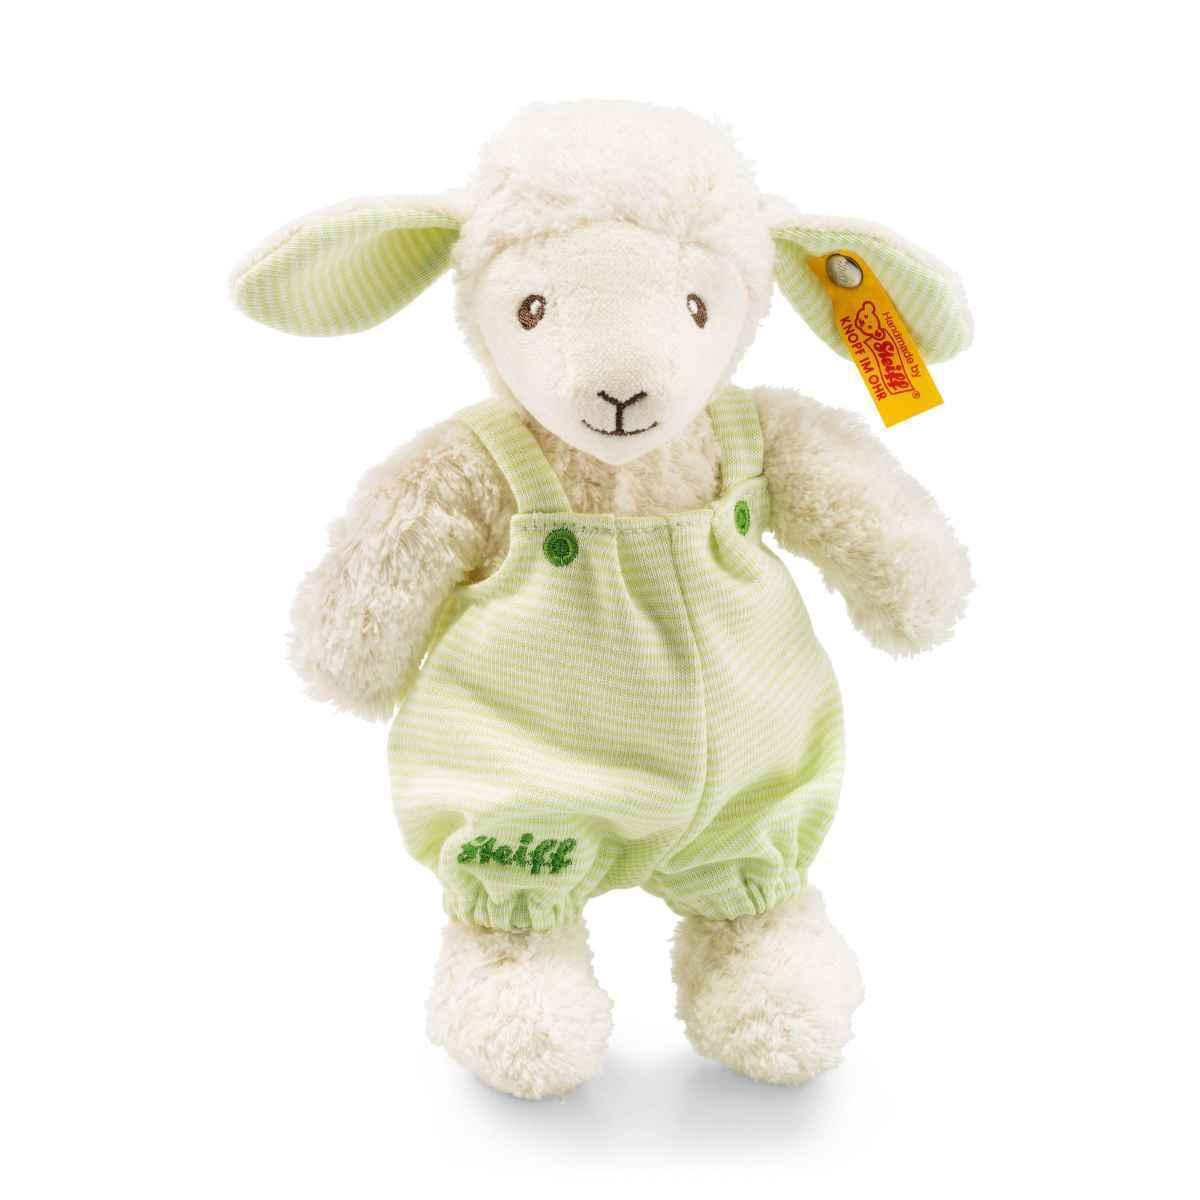 New Steiff Luxury Lenny LAMB Baby Sheep + Steiff Gift Box 237393 Teddy Bear